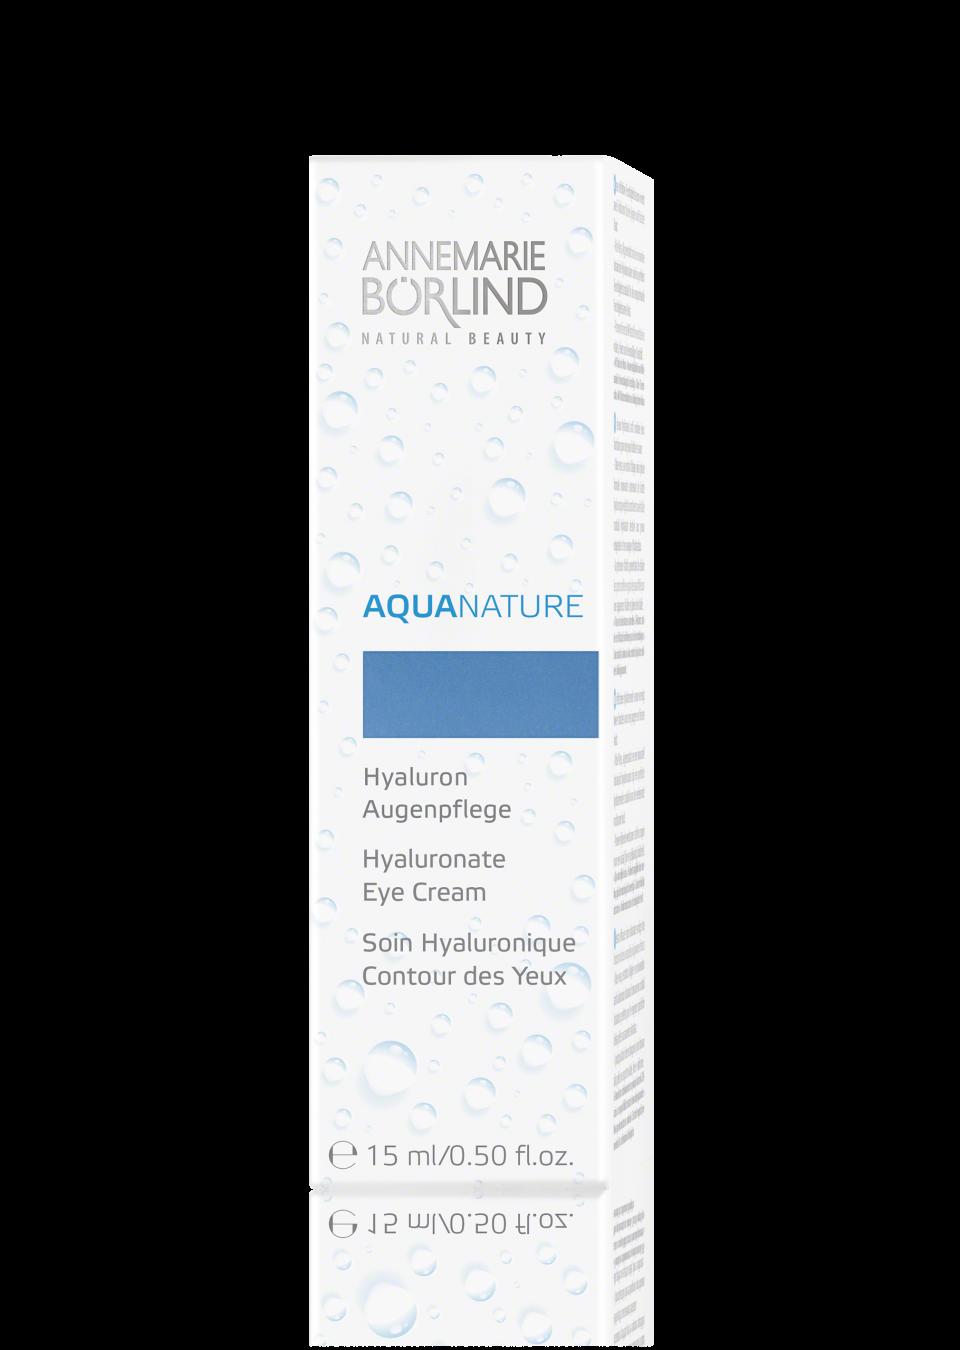 ANNEMARIE BORLIND AQUANATURE IALURONATO EYE CREAM 15 ML